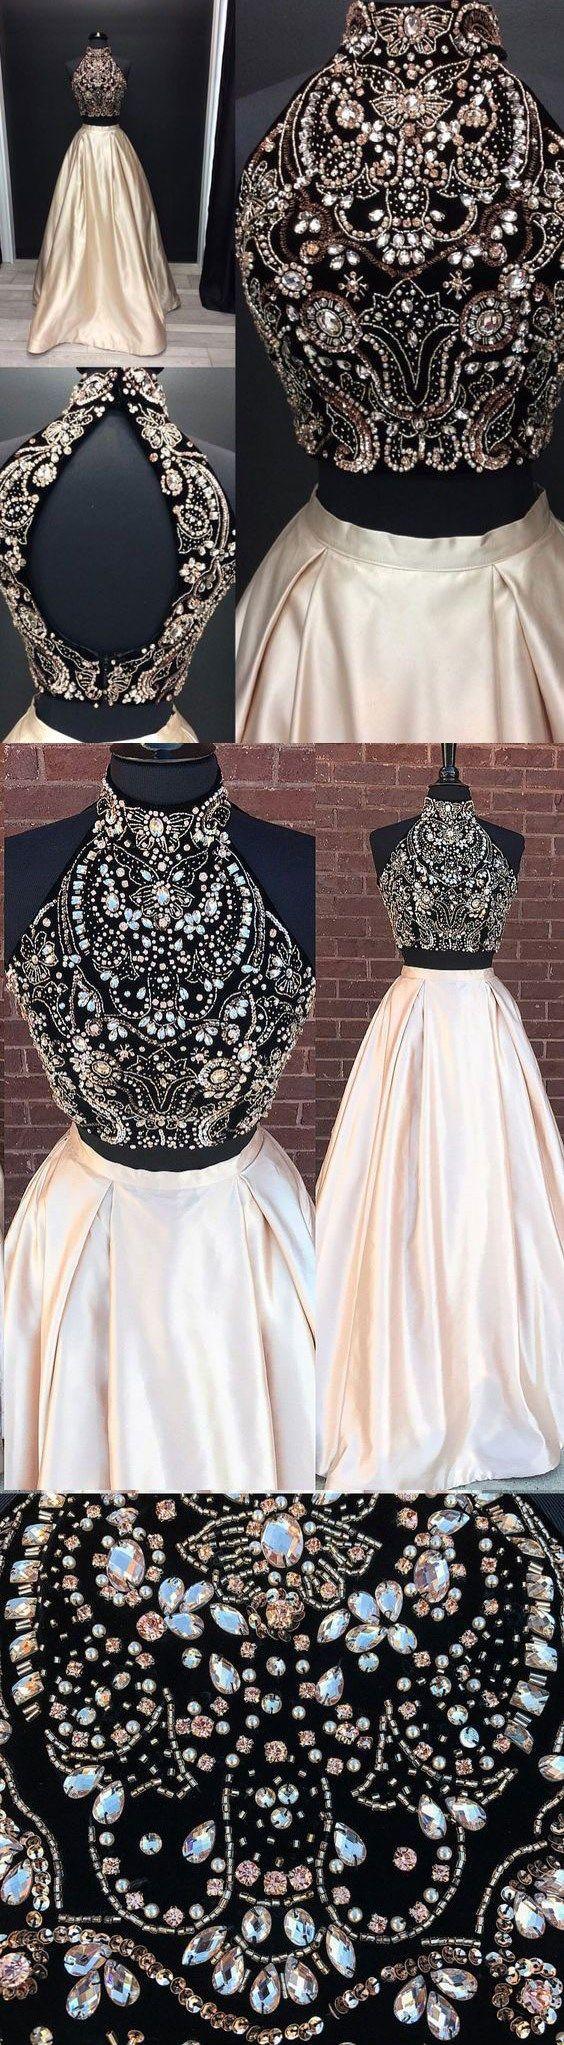 Aline vneck floor length tulle prom dressevening dress with